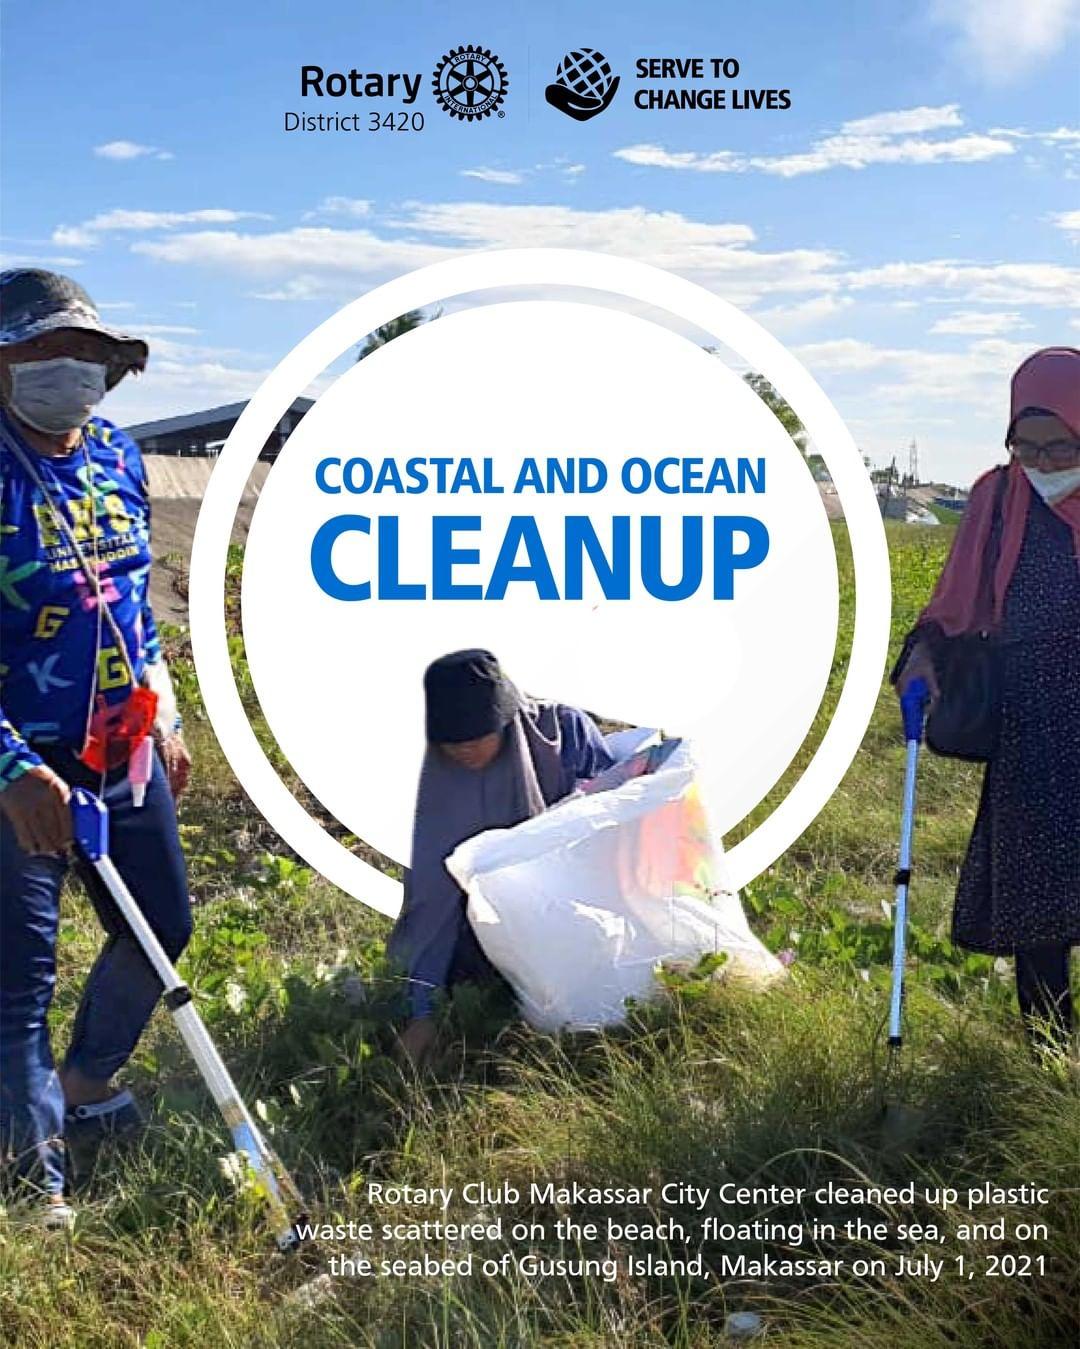 Coastal and Ocean Cleanup